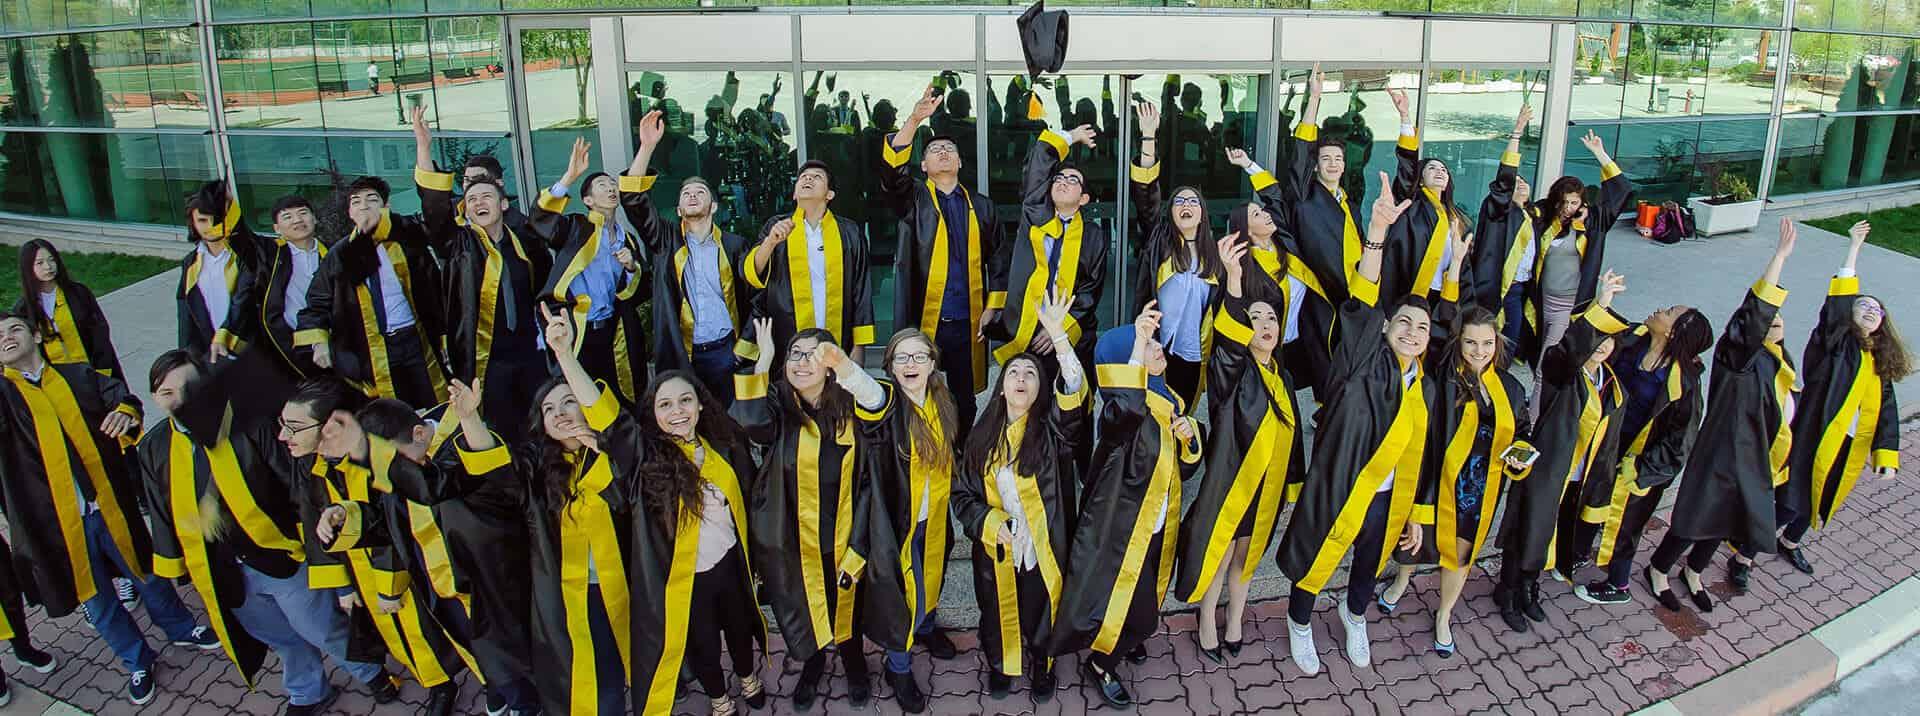 International School of Bucharest IB Results 2019